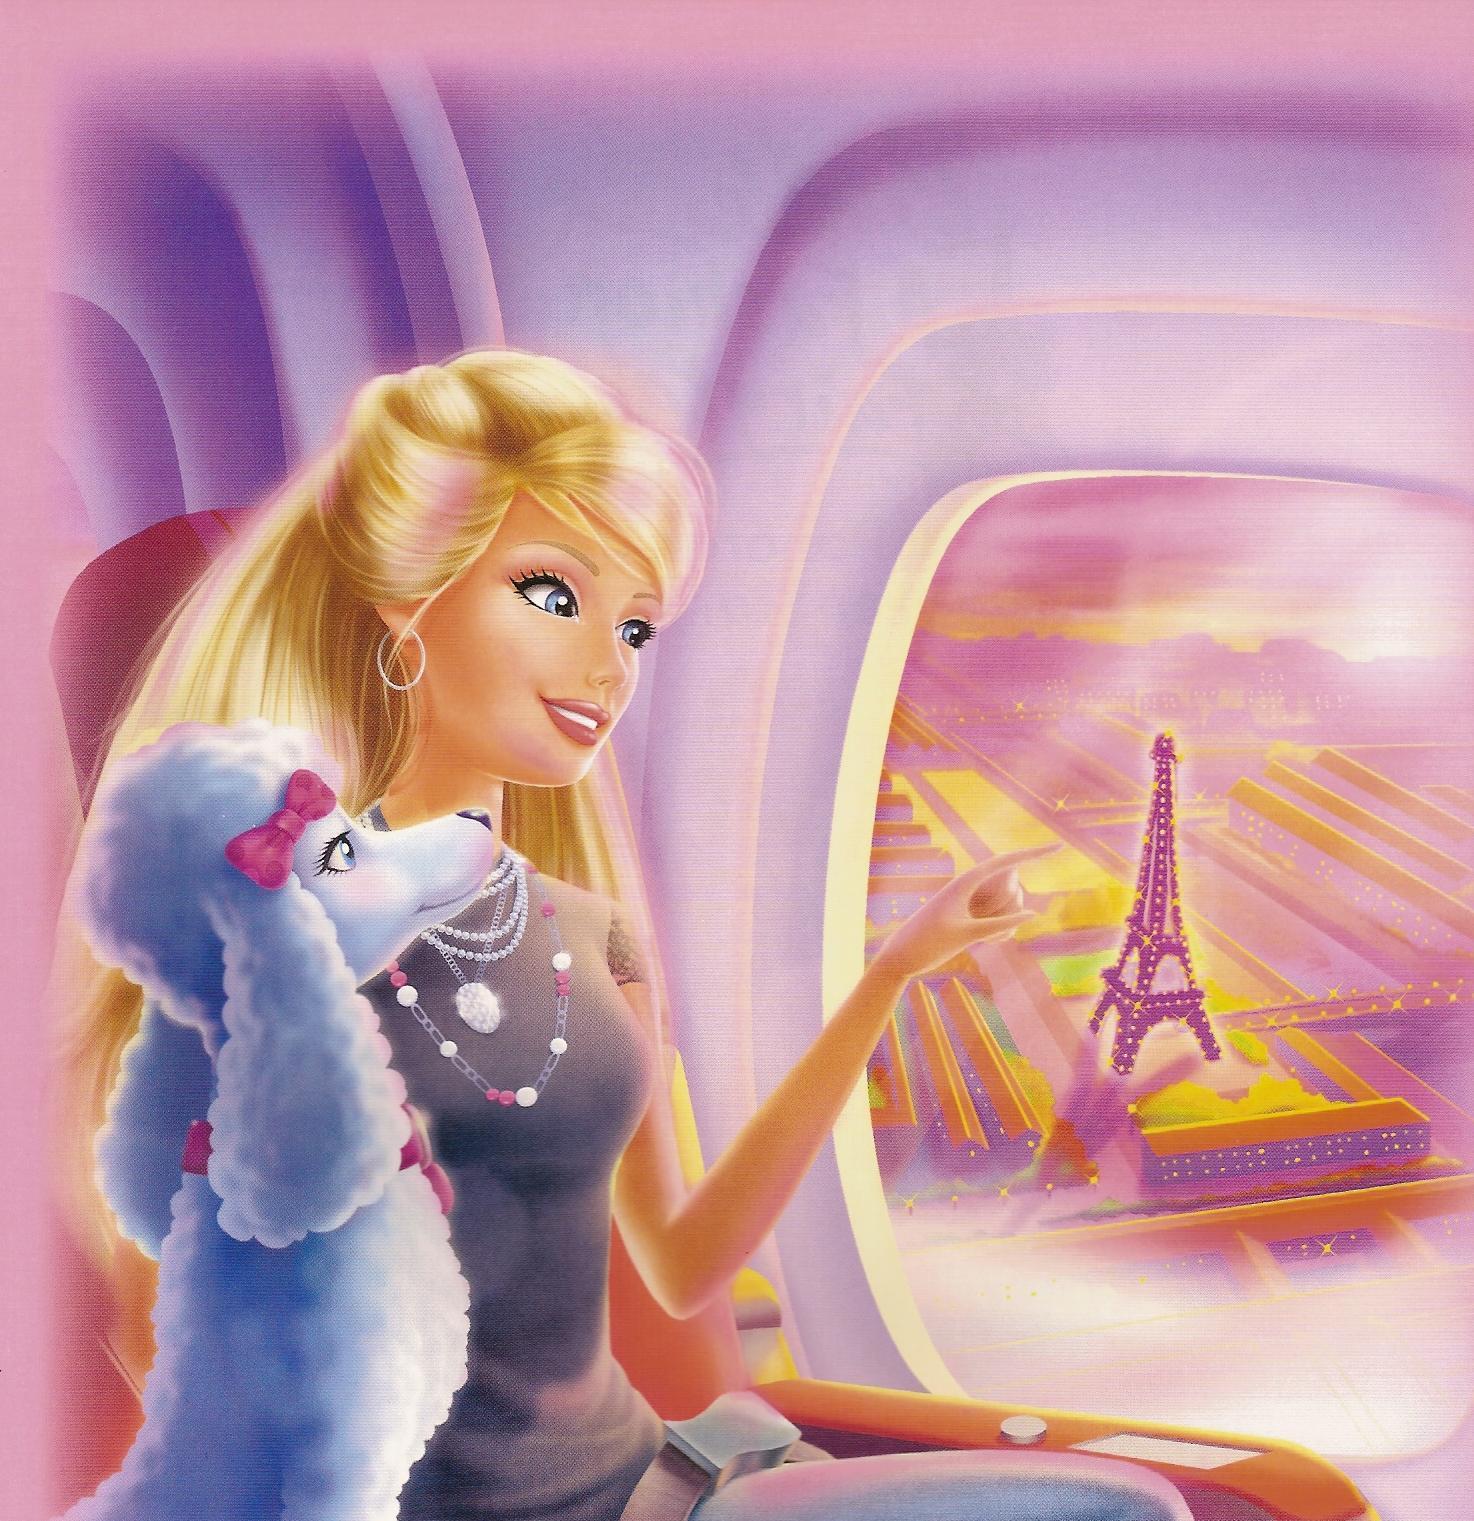 Barbie Hd Desktop Wallpaper Barbie Compilation Picture 2013